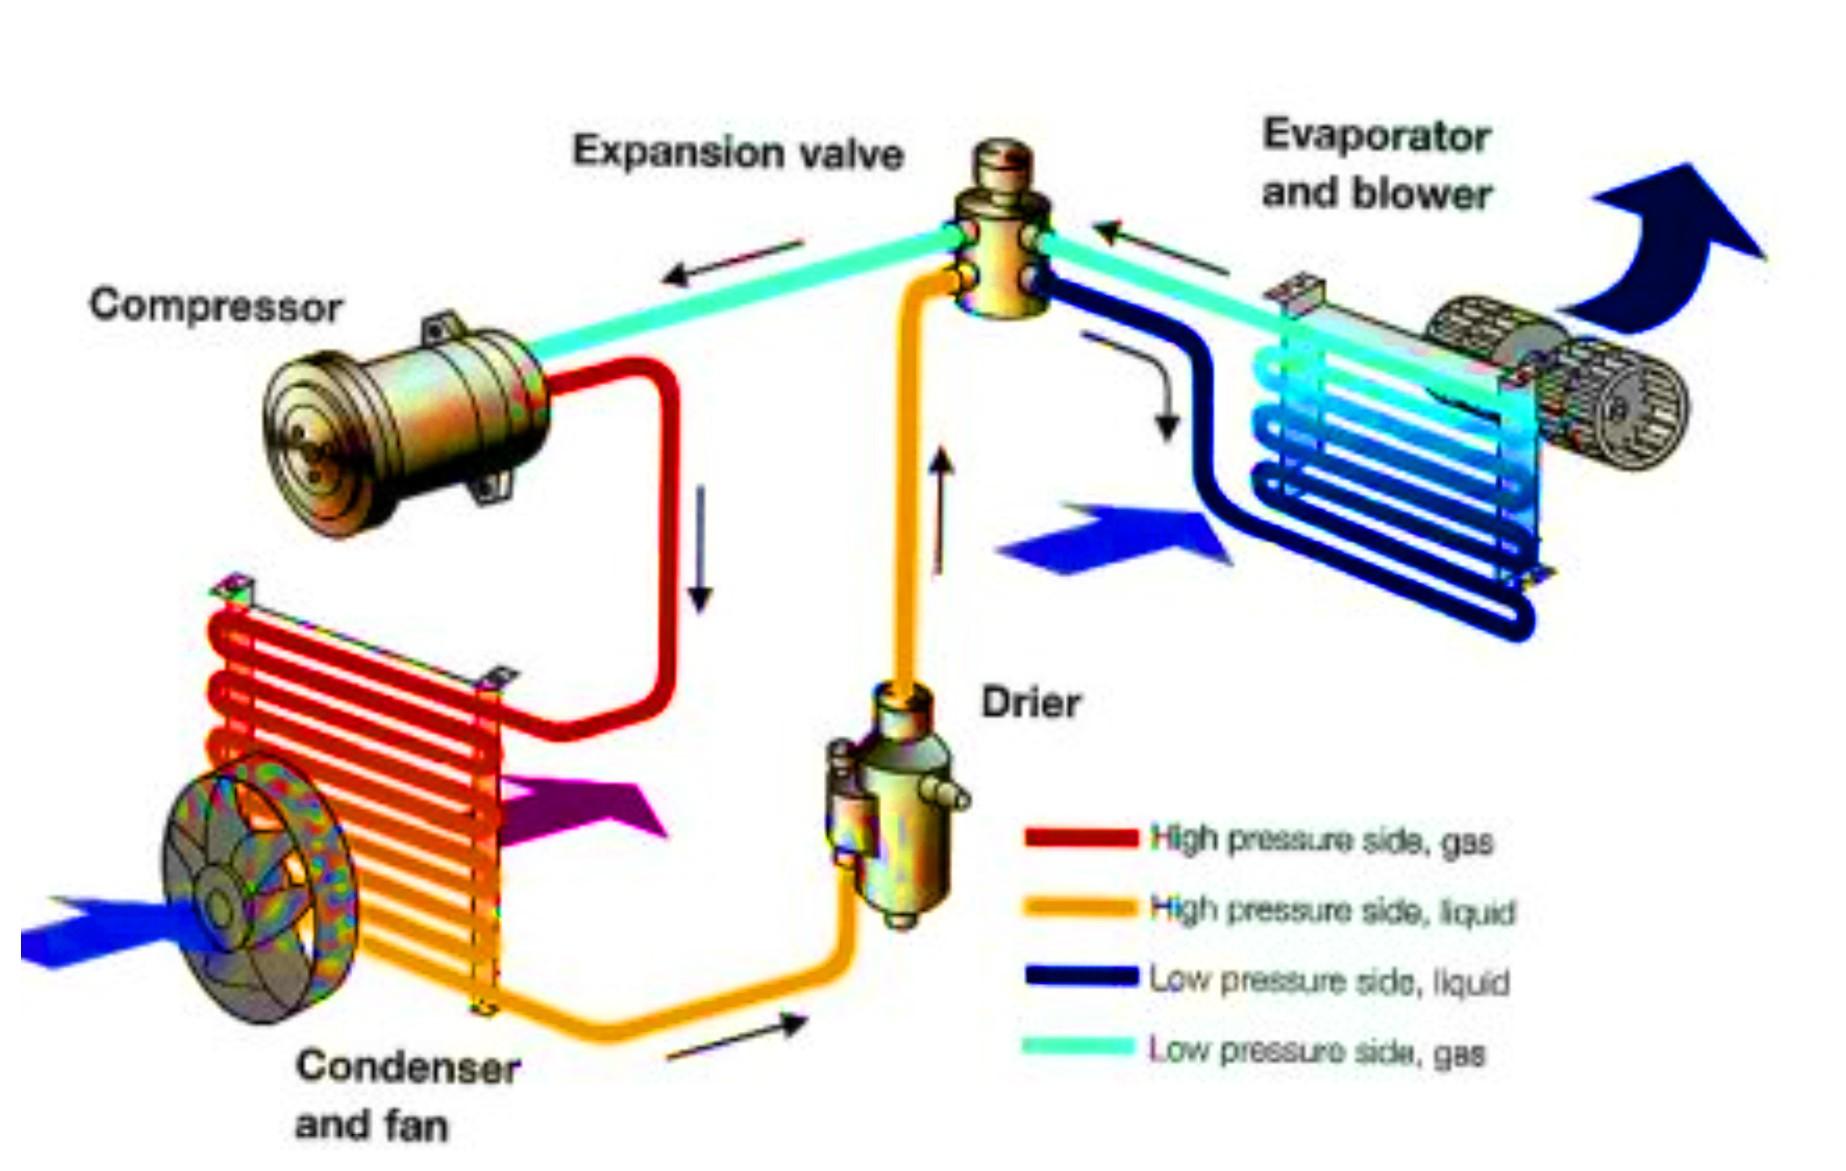 Car Ac Parts Diagram | My Wiring DIagram